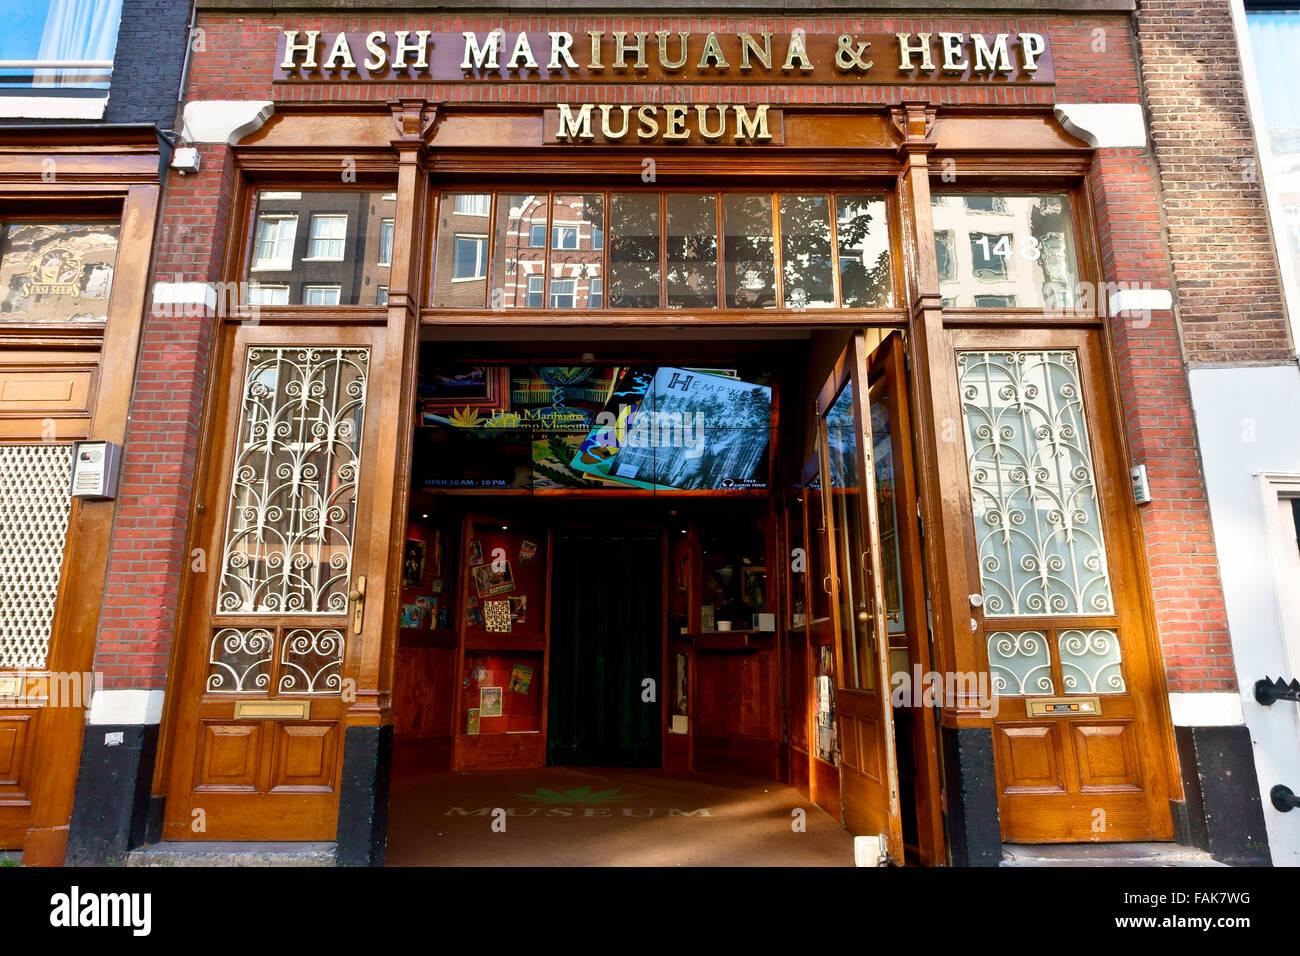 hash marijuana hemp museum light district amsterdam stock photo royalty free